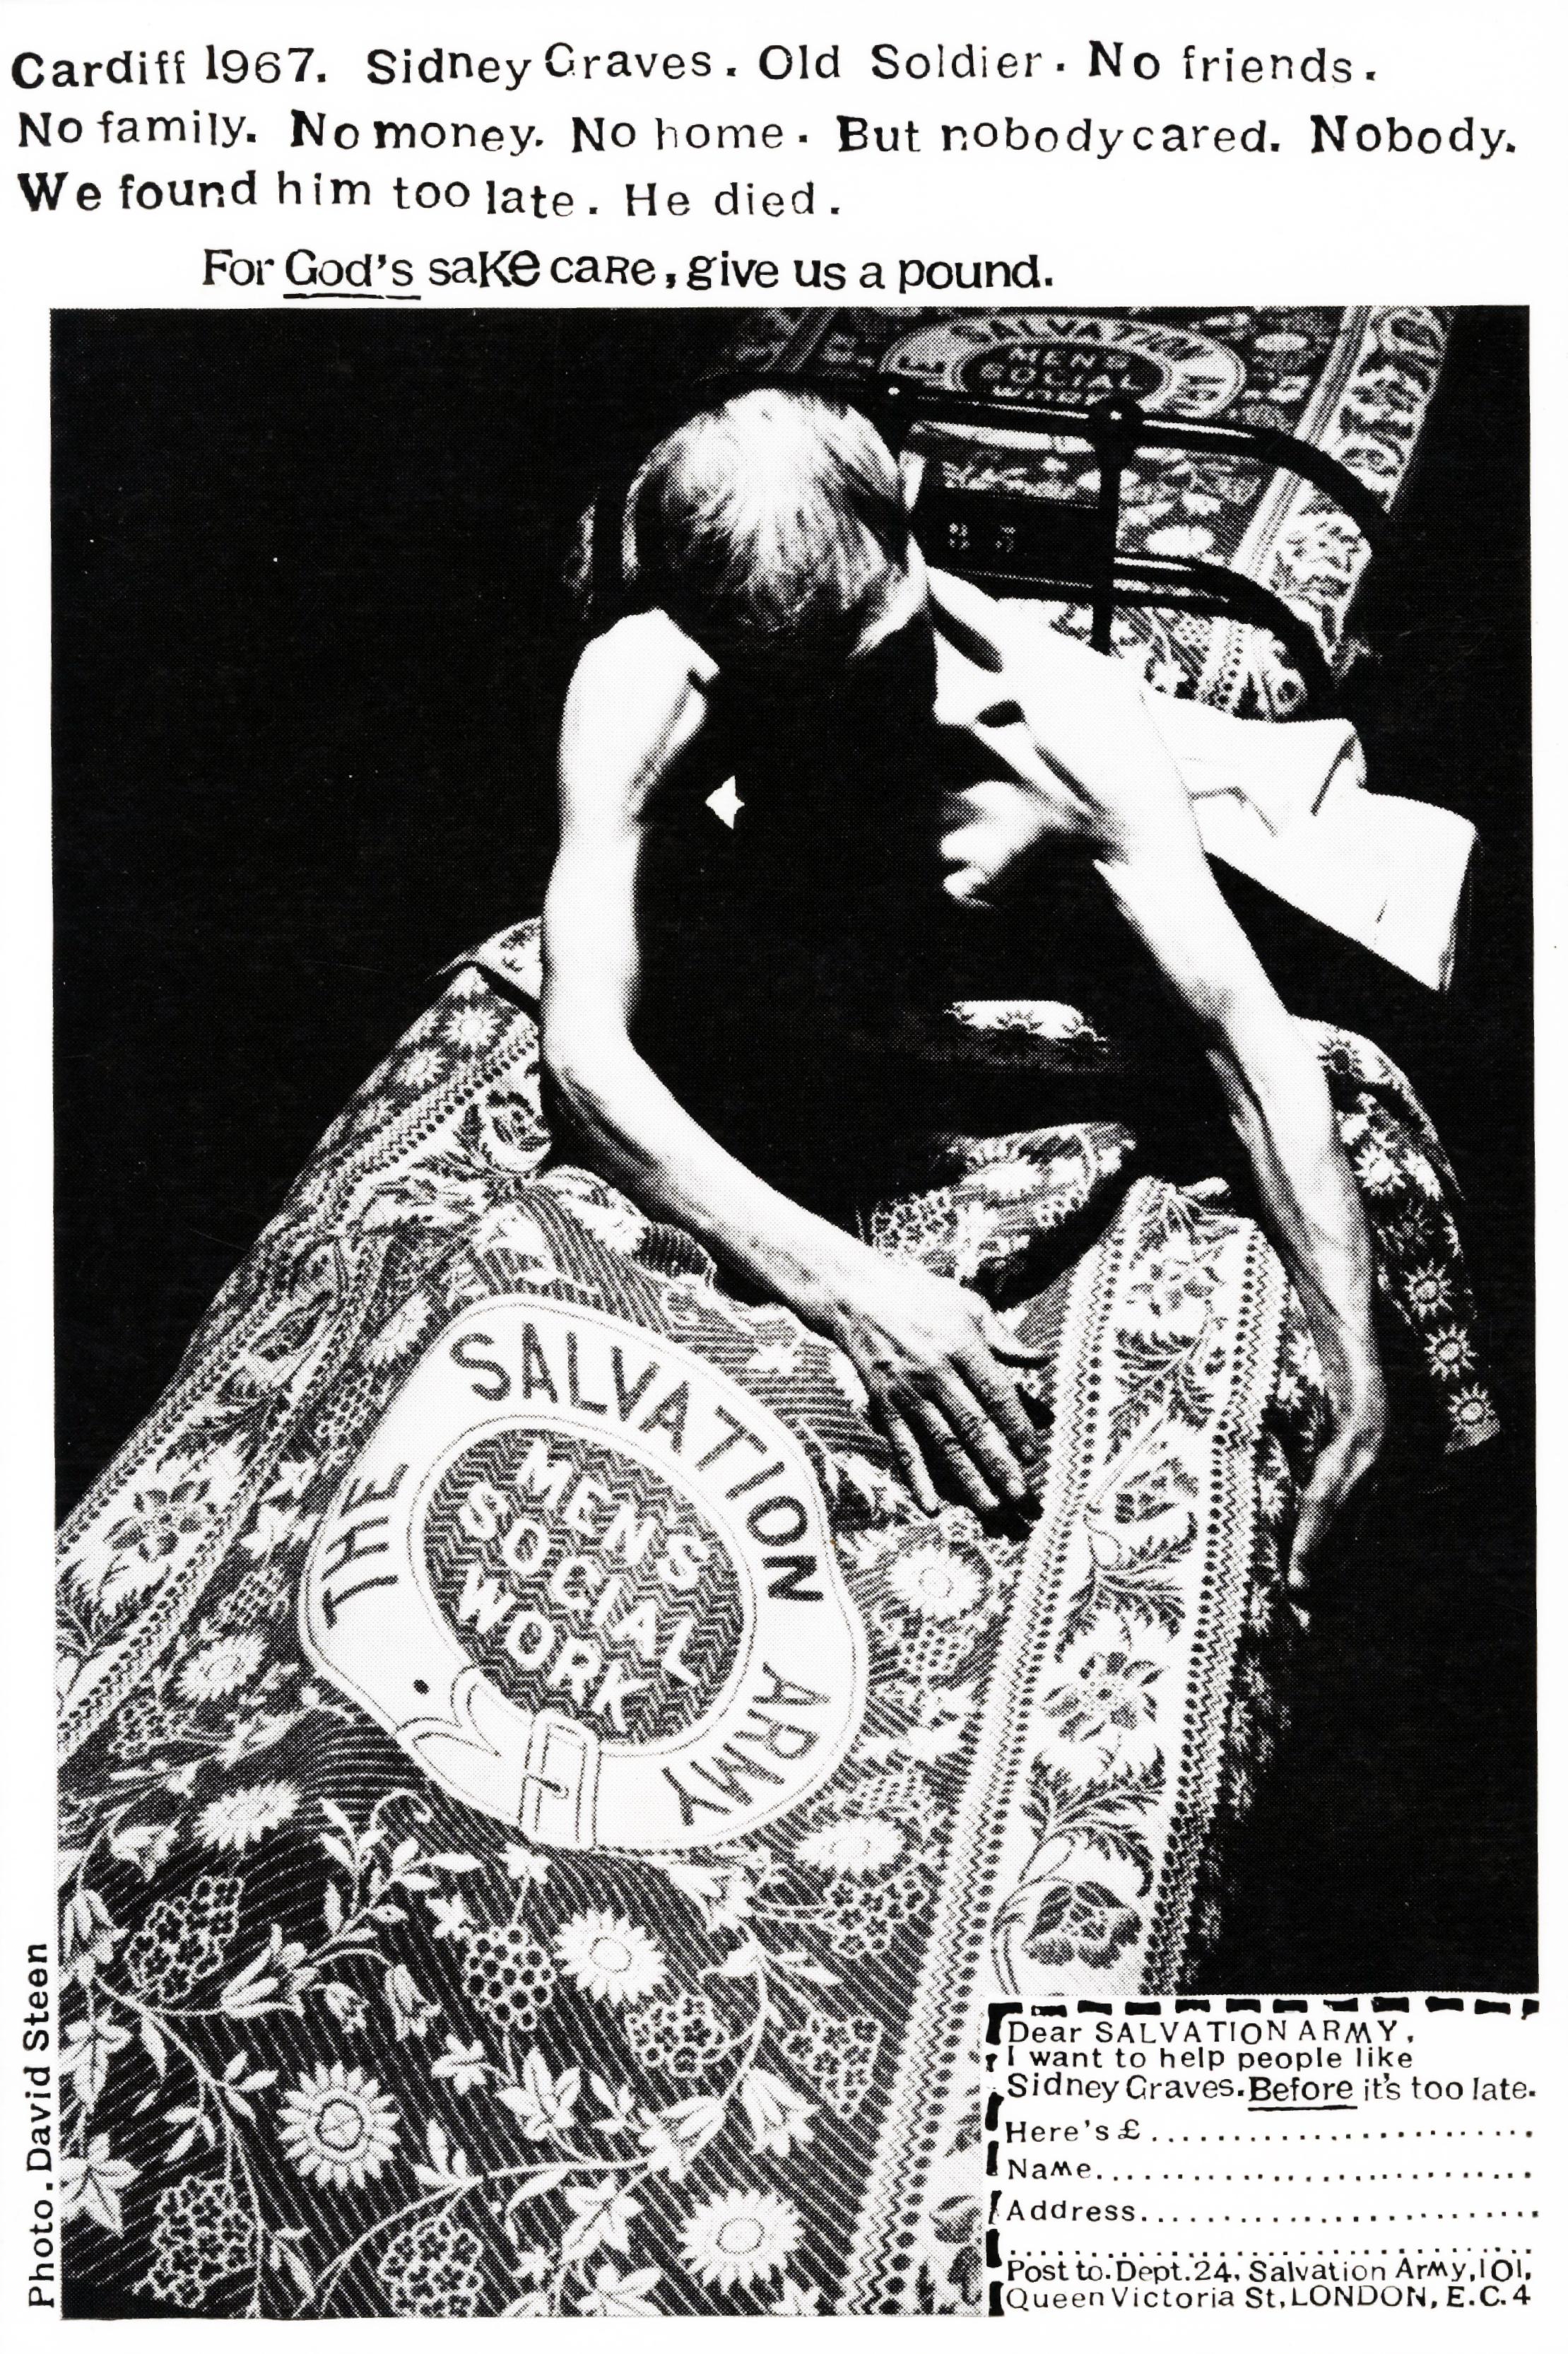 Salvation Army 'Blanket*', David Holmes, KMP-01